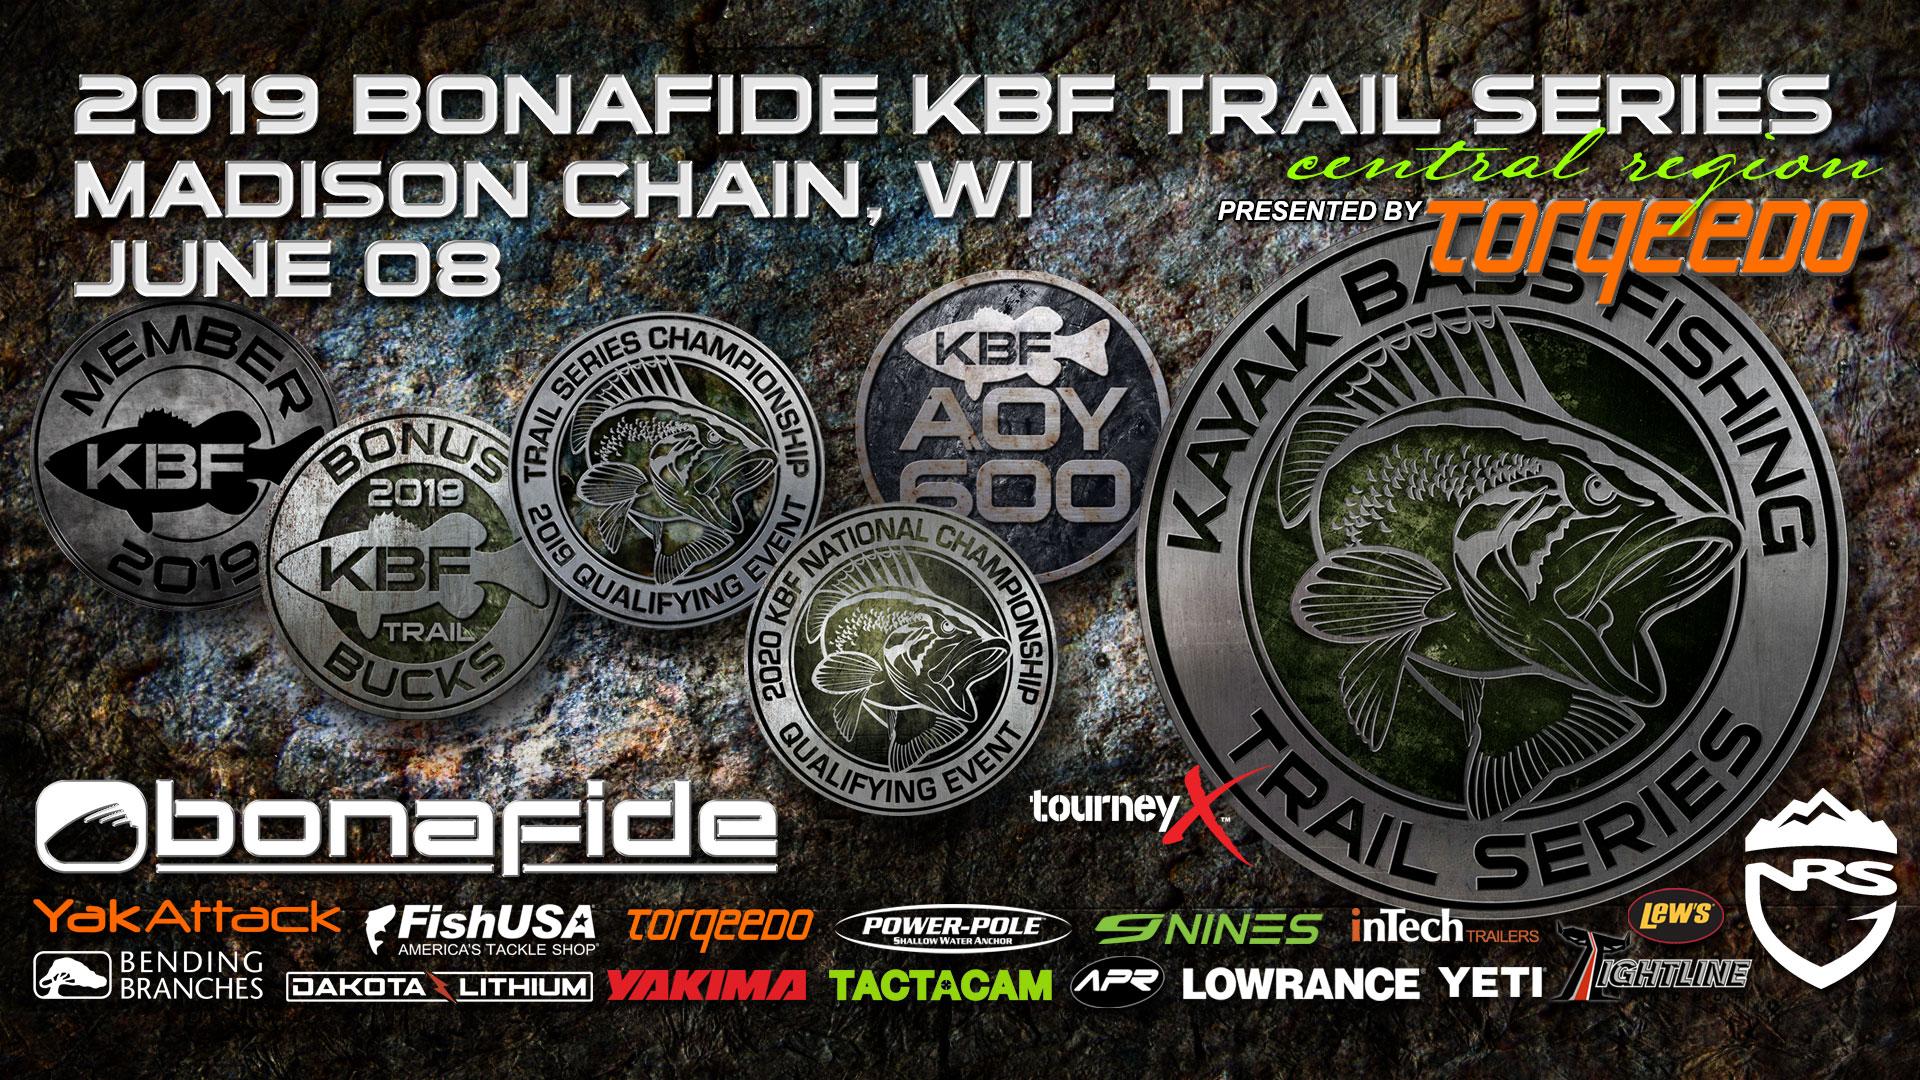 Bonafide KBF TRAIL Series Tournament - Madison Chain, WI